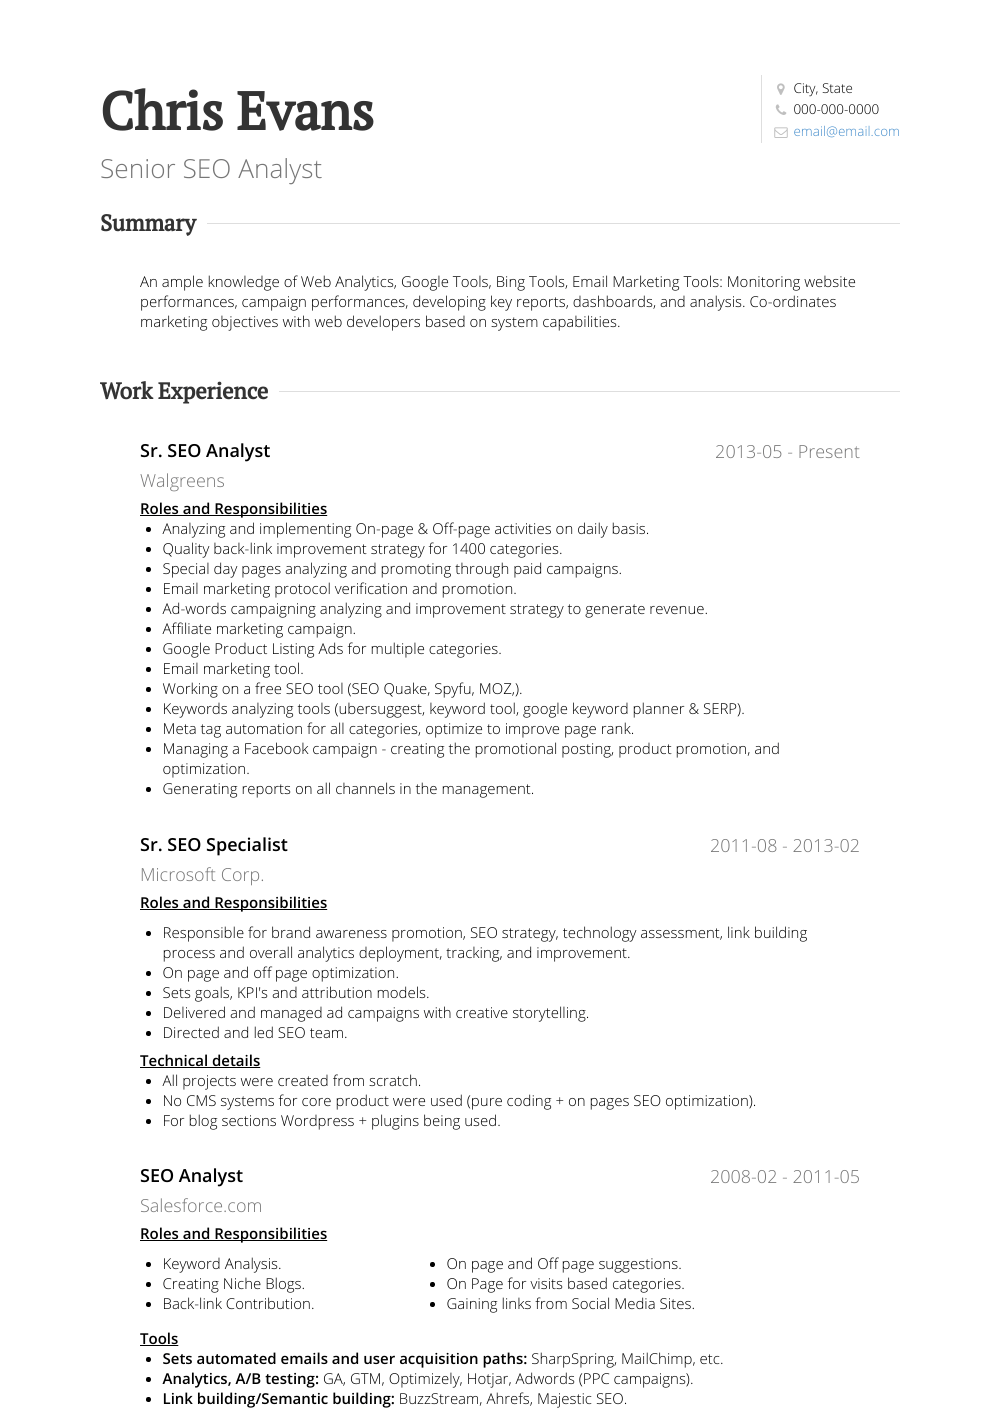 Seo Analyst - Resume Samples & Templates | VisualCV